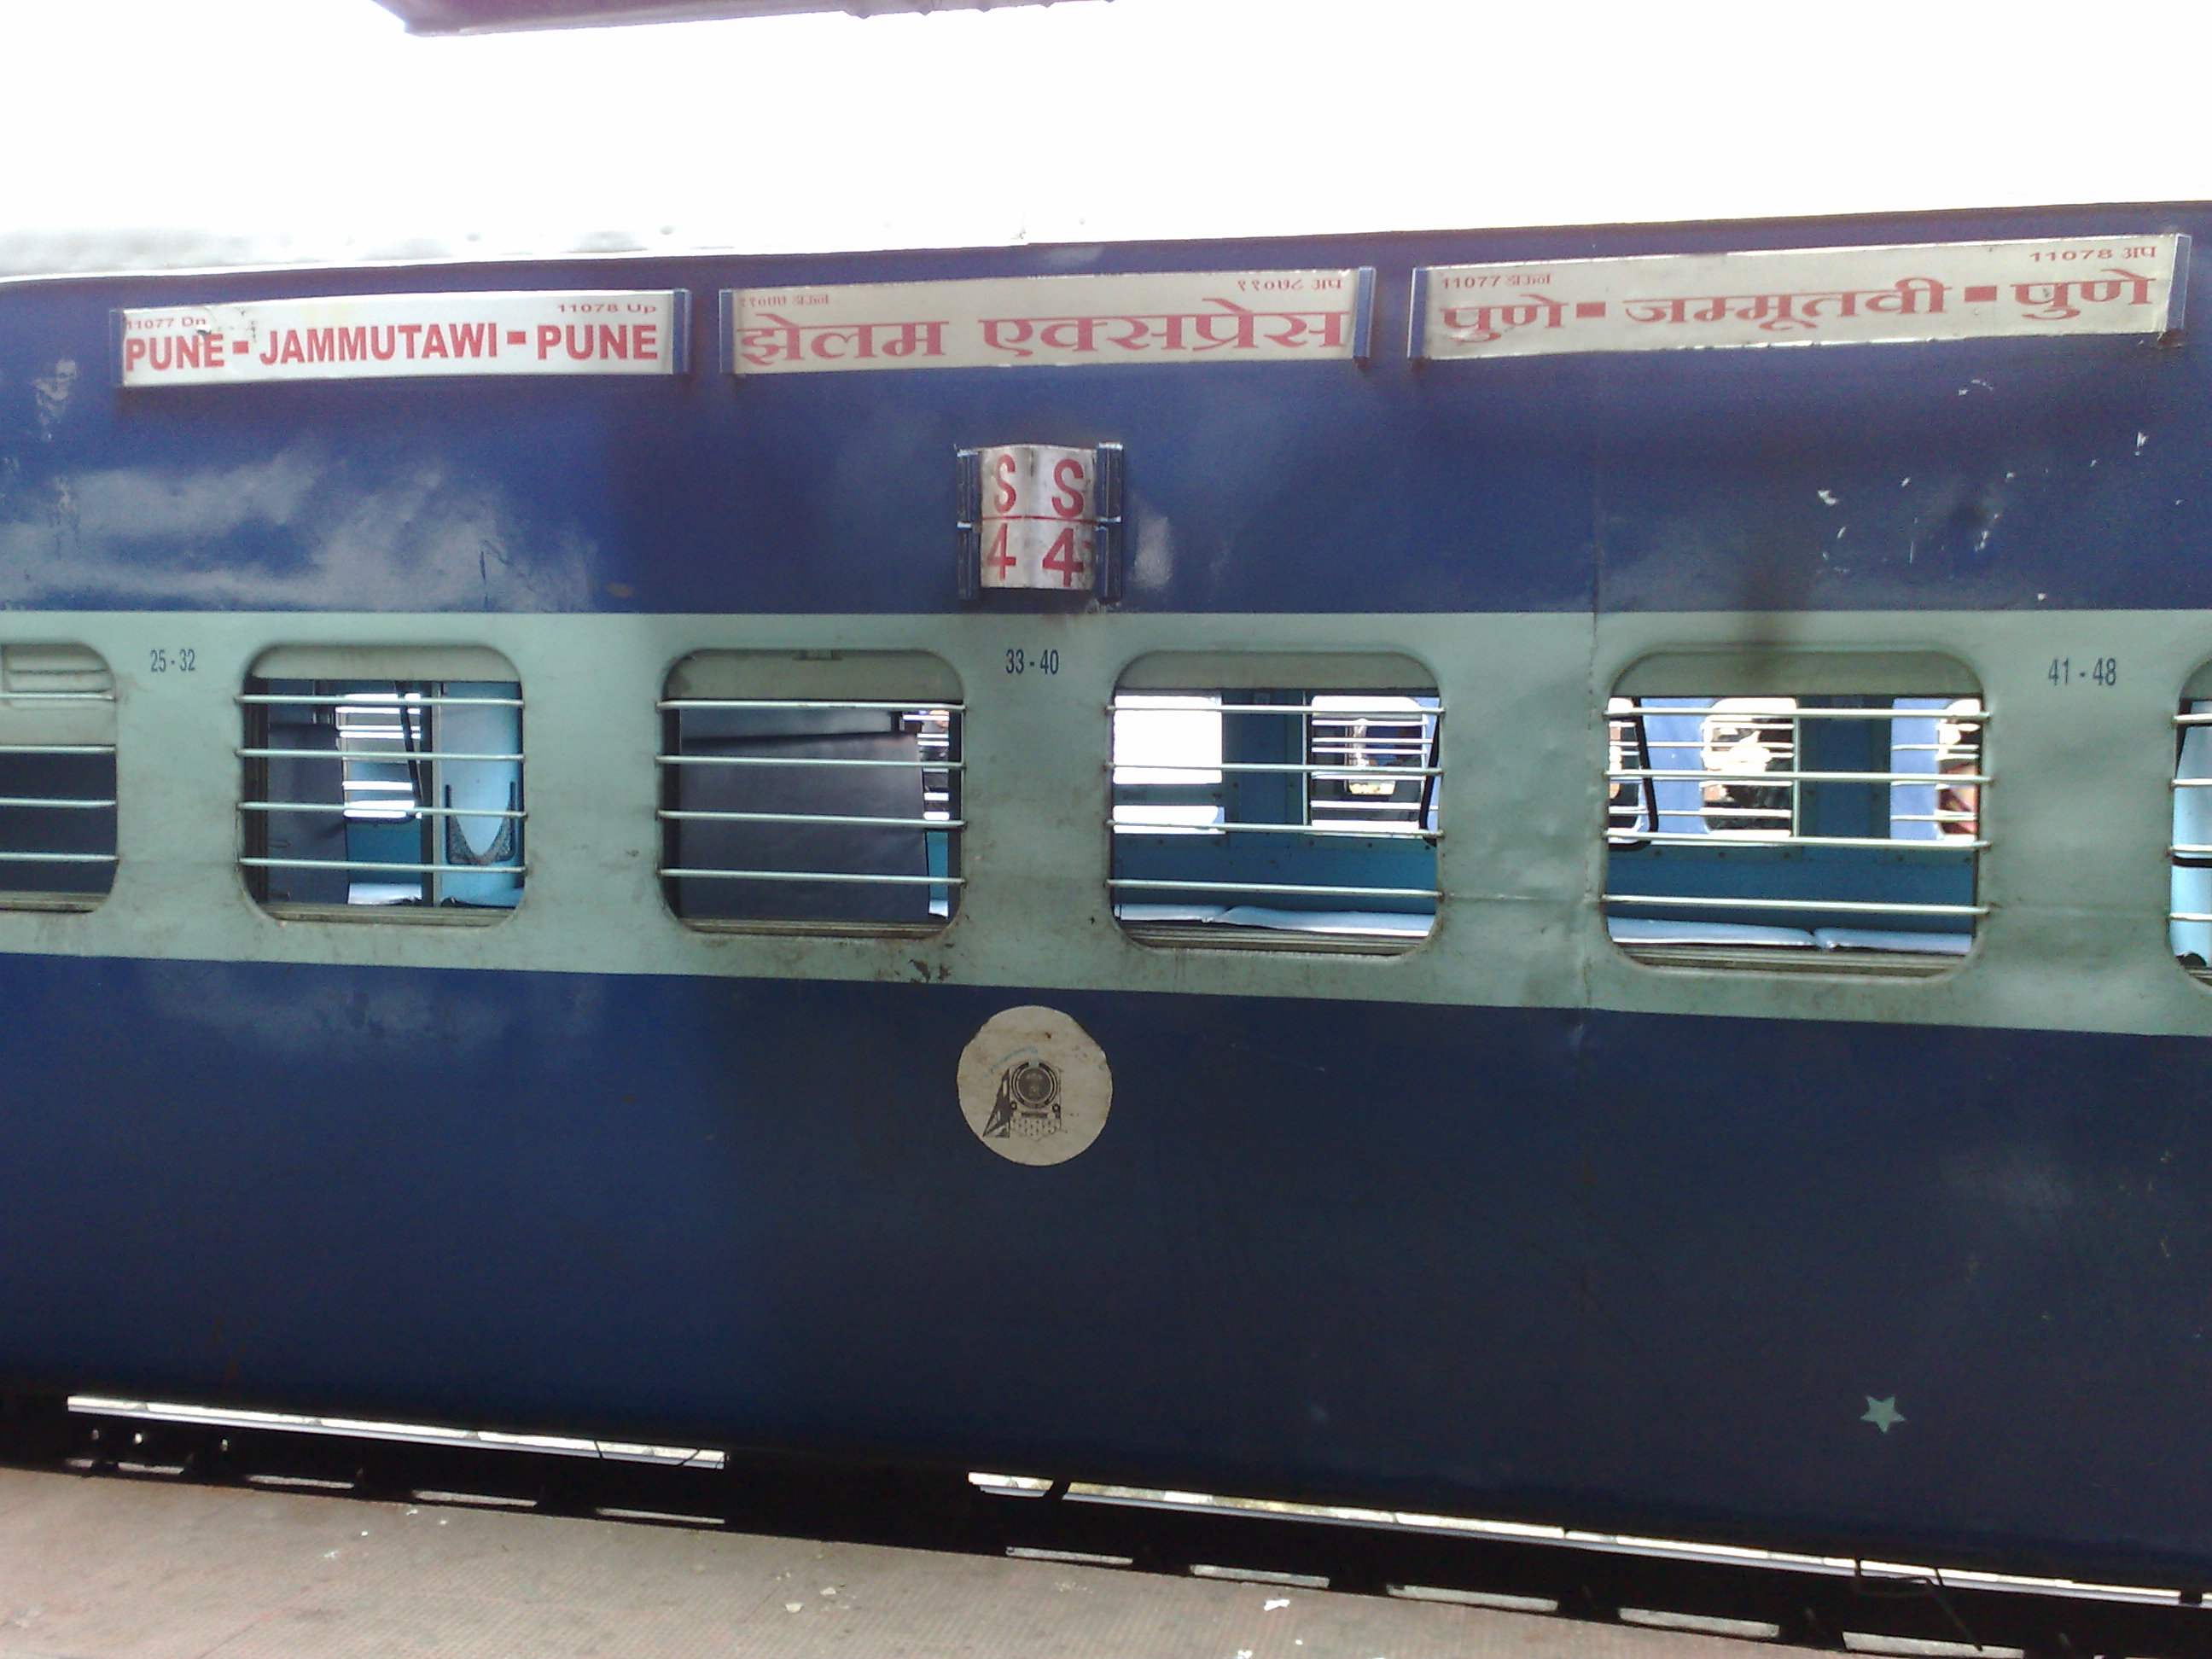 File:11077 Jhelum Express - Sleeper coach.jpg